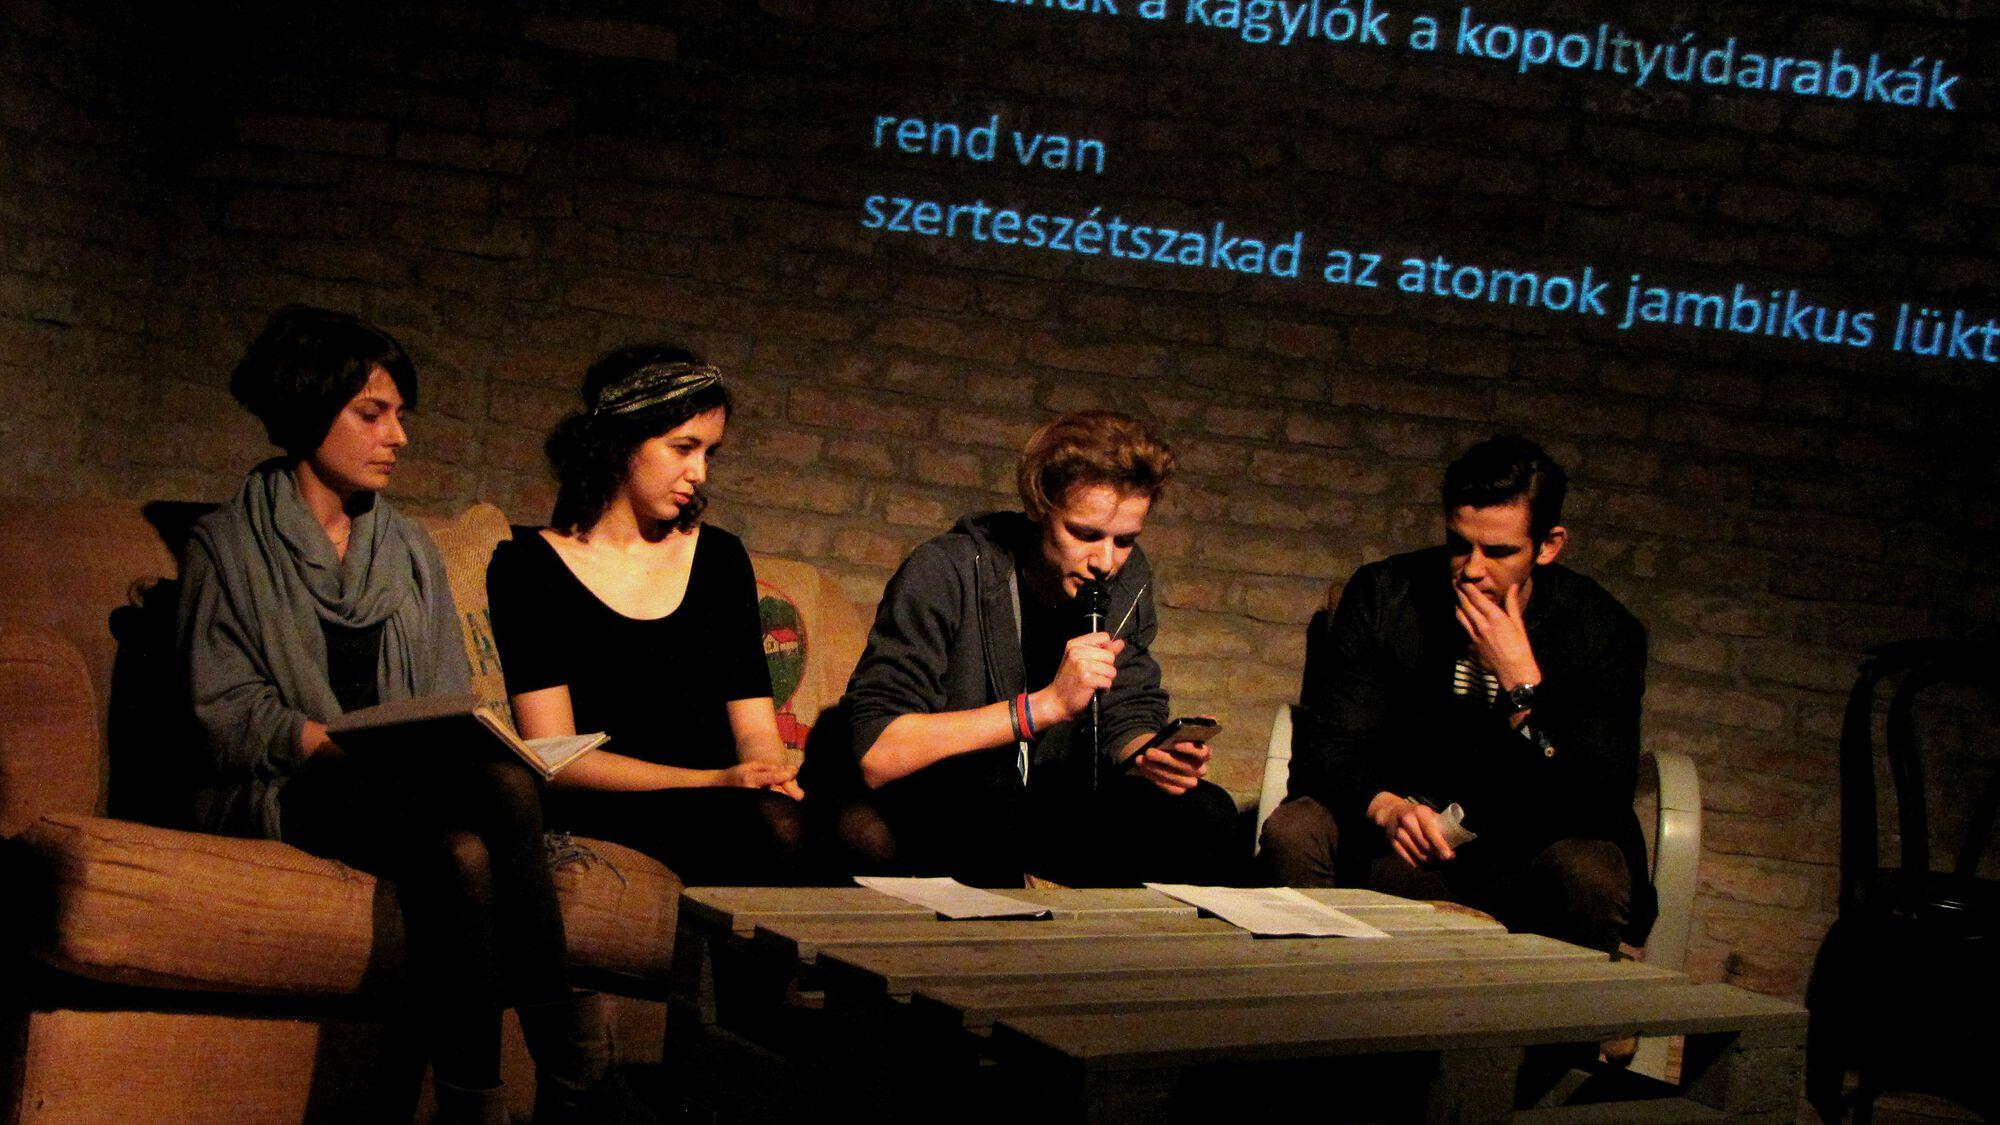 Vers-show / Vallai Kert